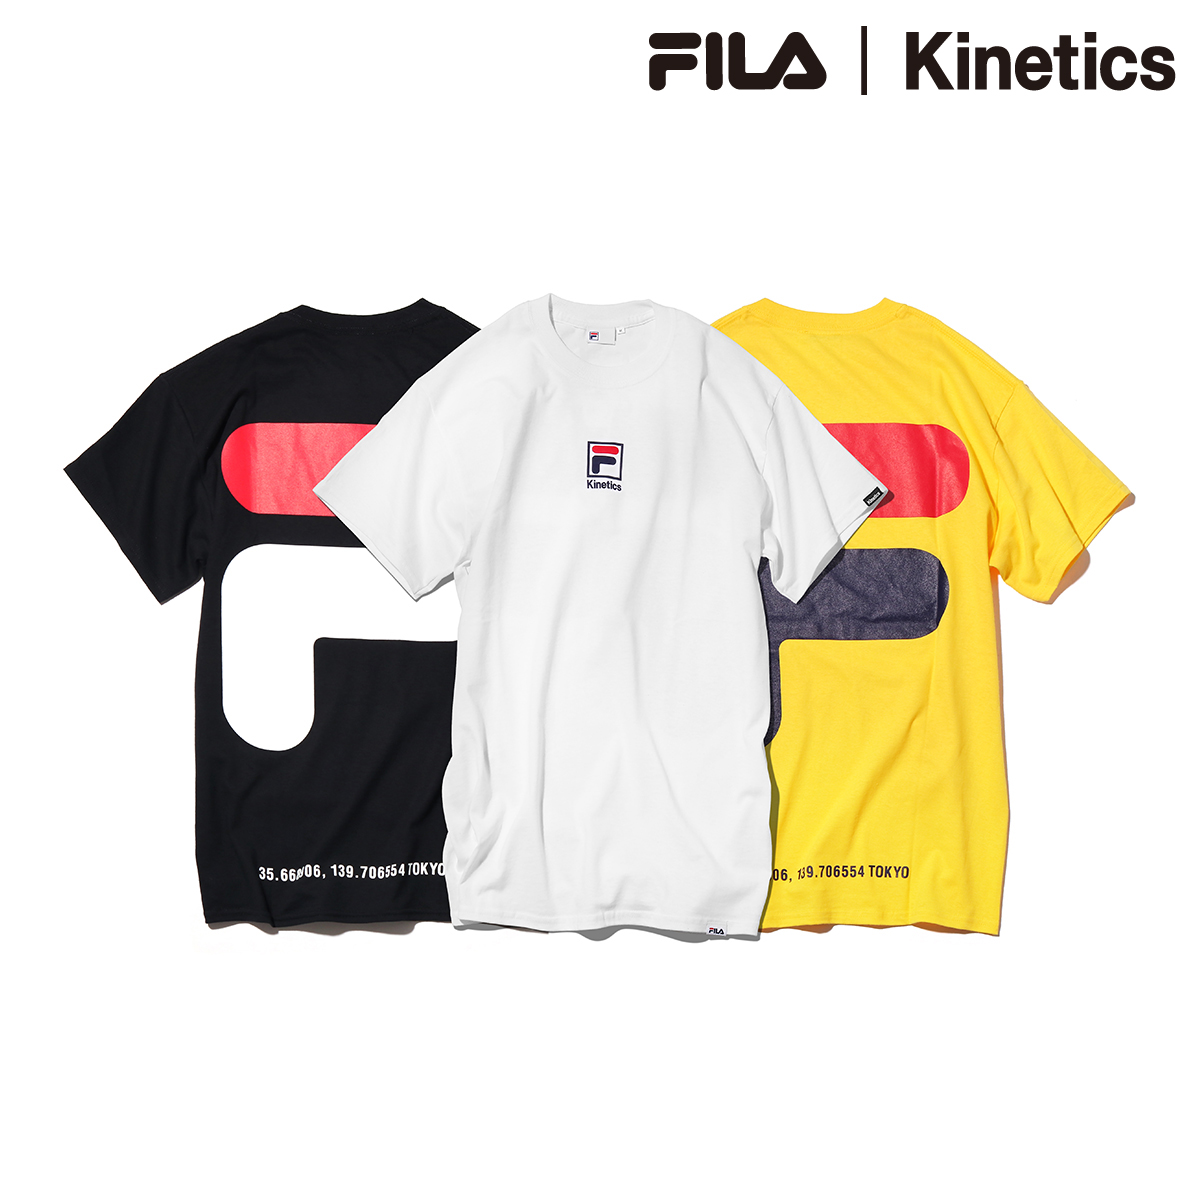 FILA X Kinetics BIG HOUSE LOGO TEE (Fila KINETIQUE's T-shirt) (three colors  of development) 18SS-I